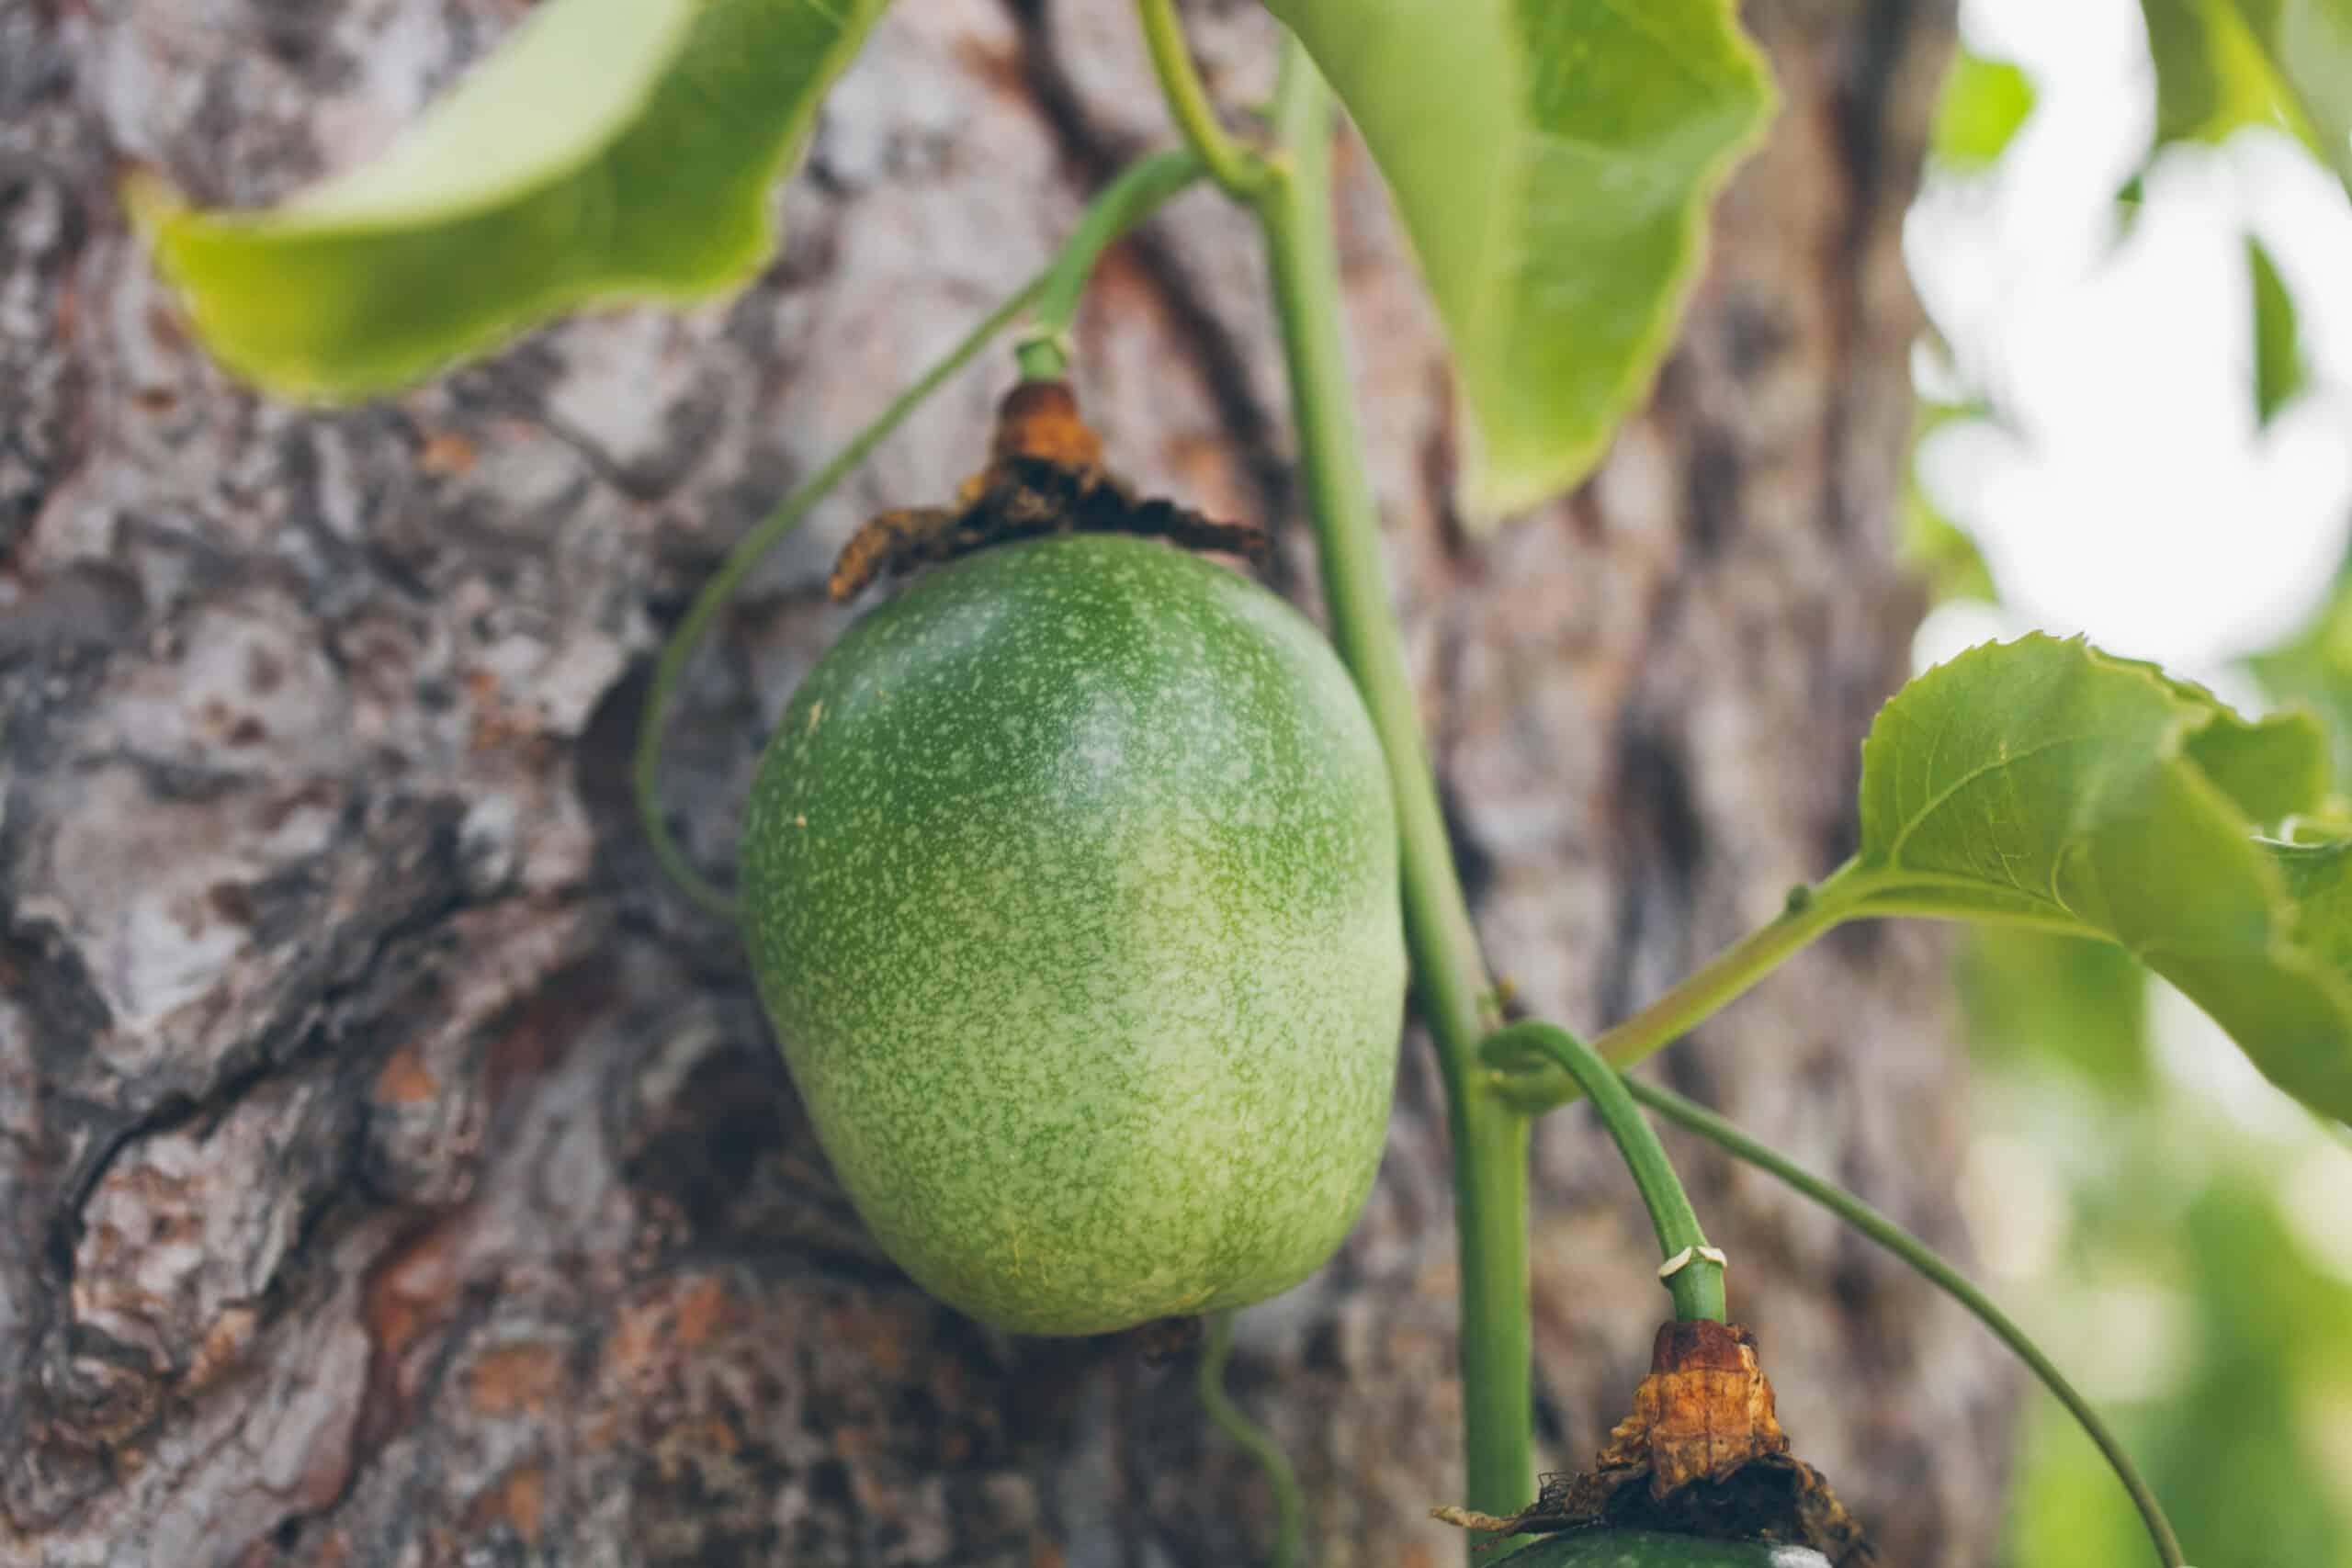 plantio de maracujá